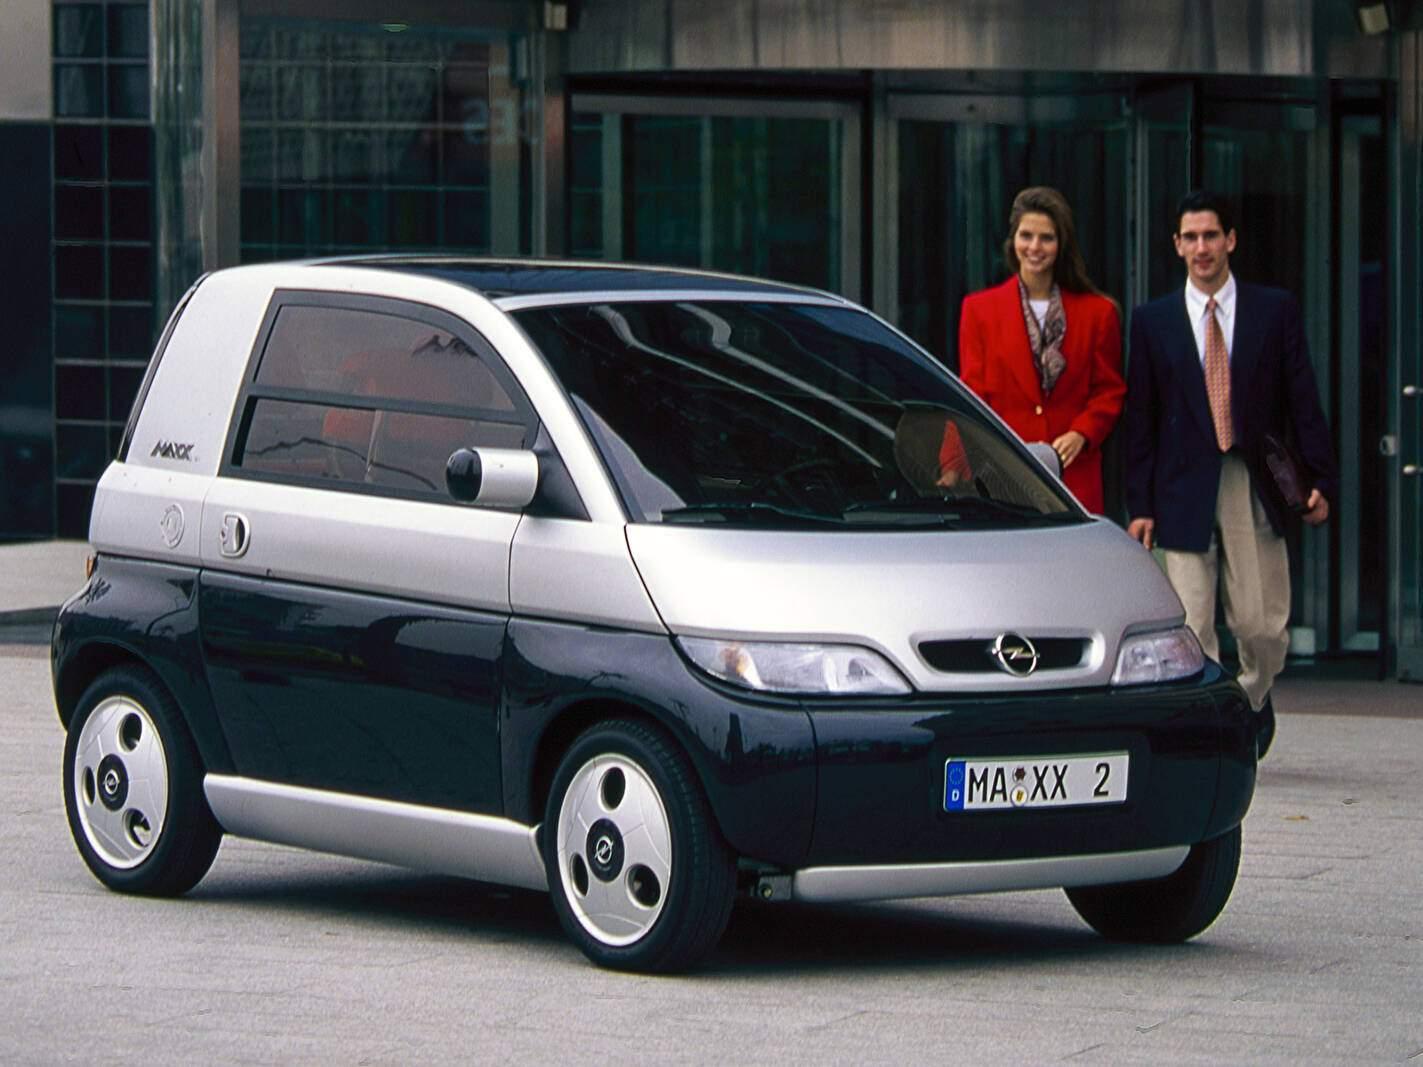 Opel Maxx Concept (1995),  ajouté par fox58